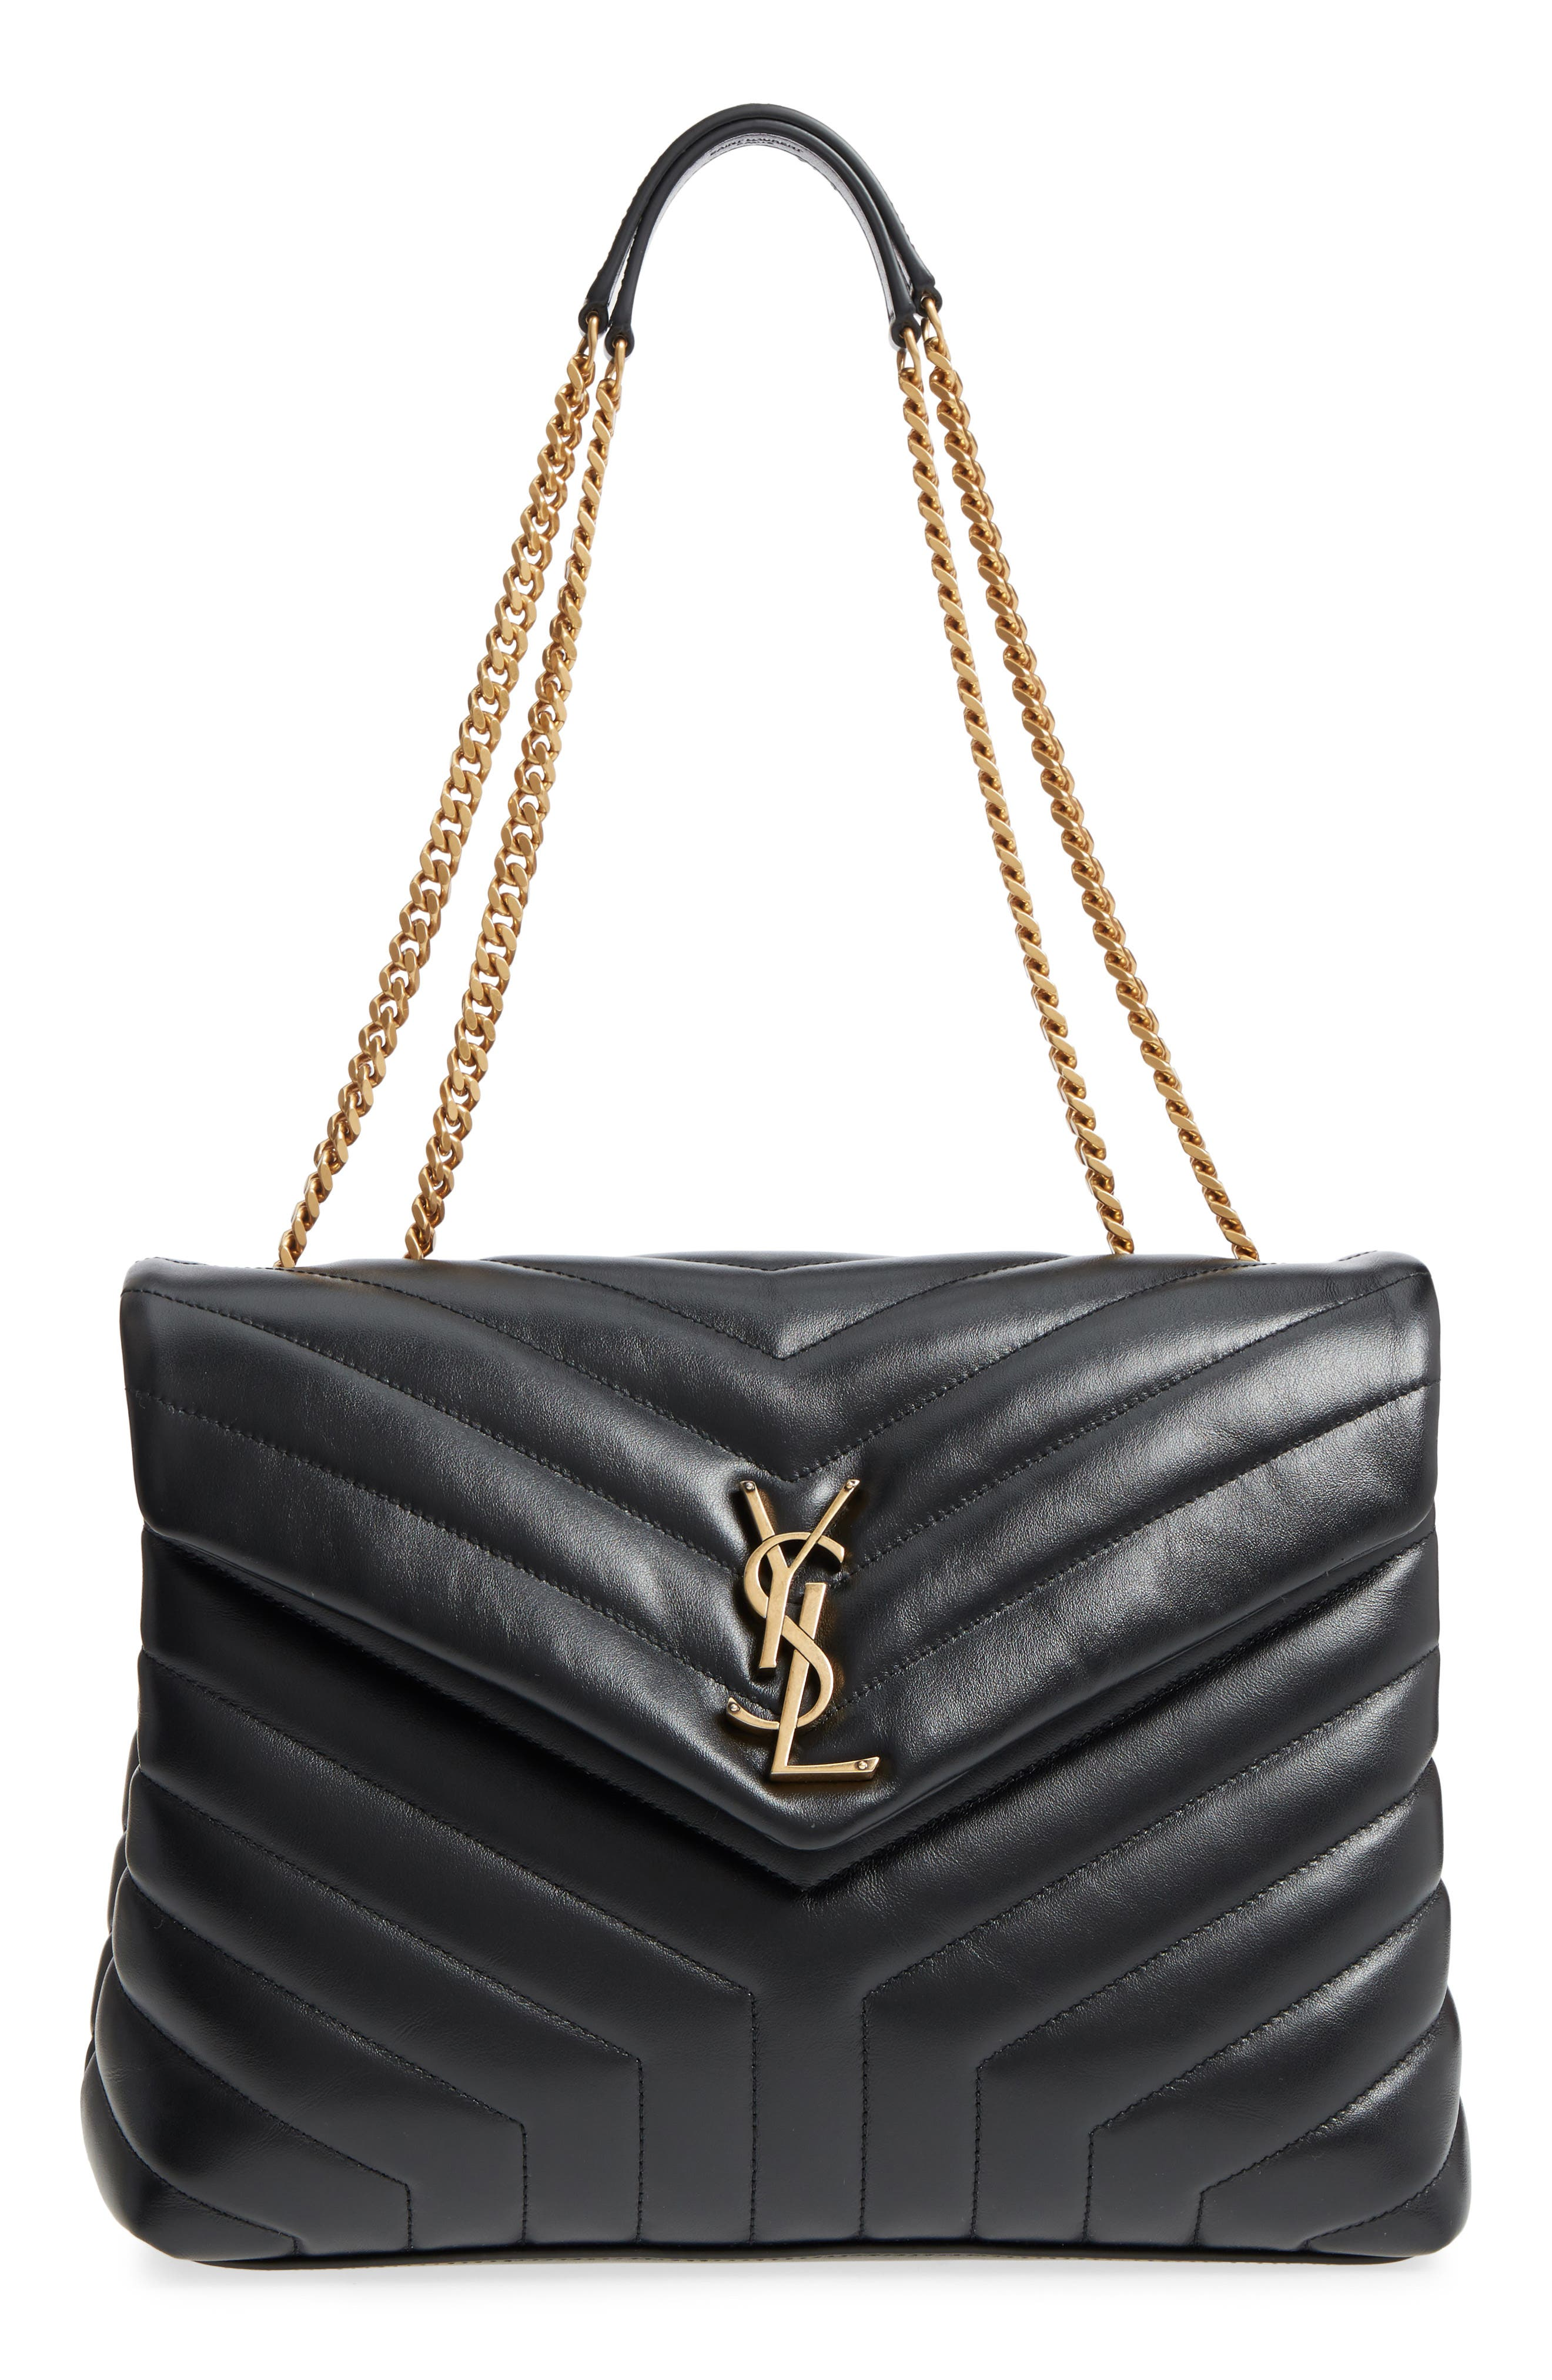 Saint Laurent Medium LouLou Matelassé Calfskin Leather Shoulder Bag